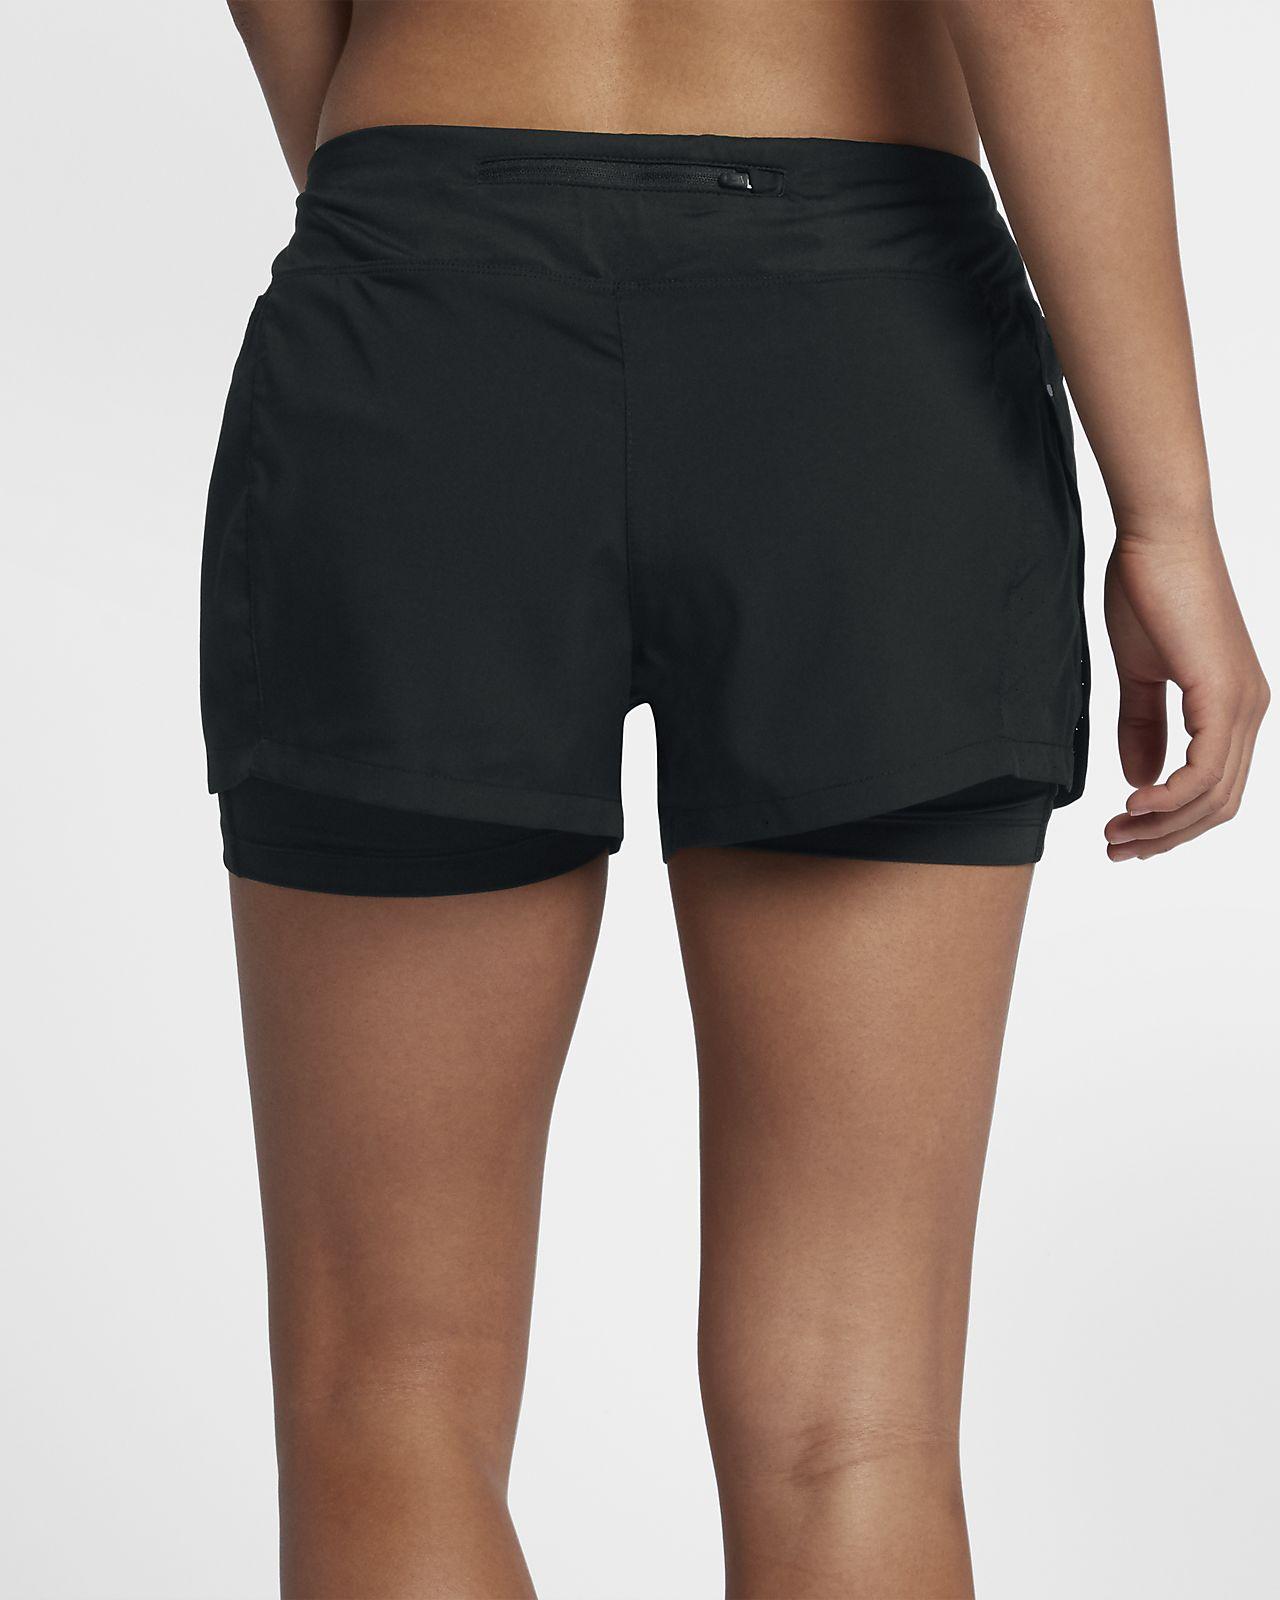 8446fbddd23 Nike Eclipse Women s 2-in-1 Running Shorts. Nike.com